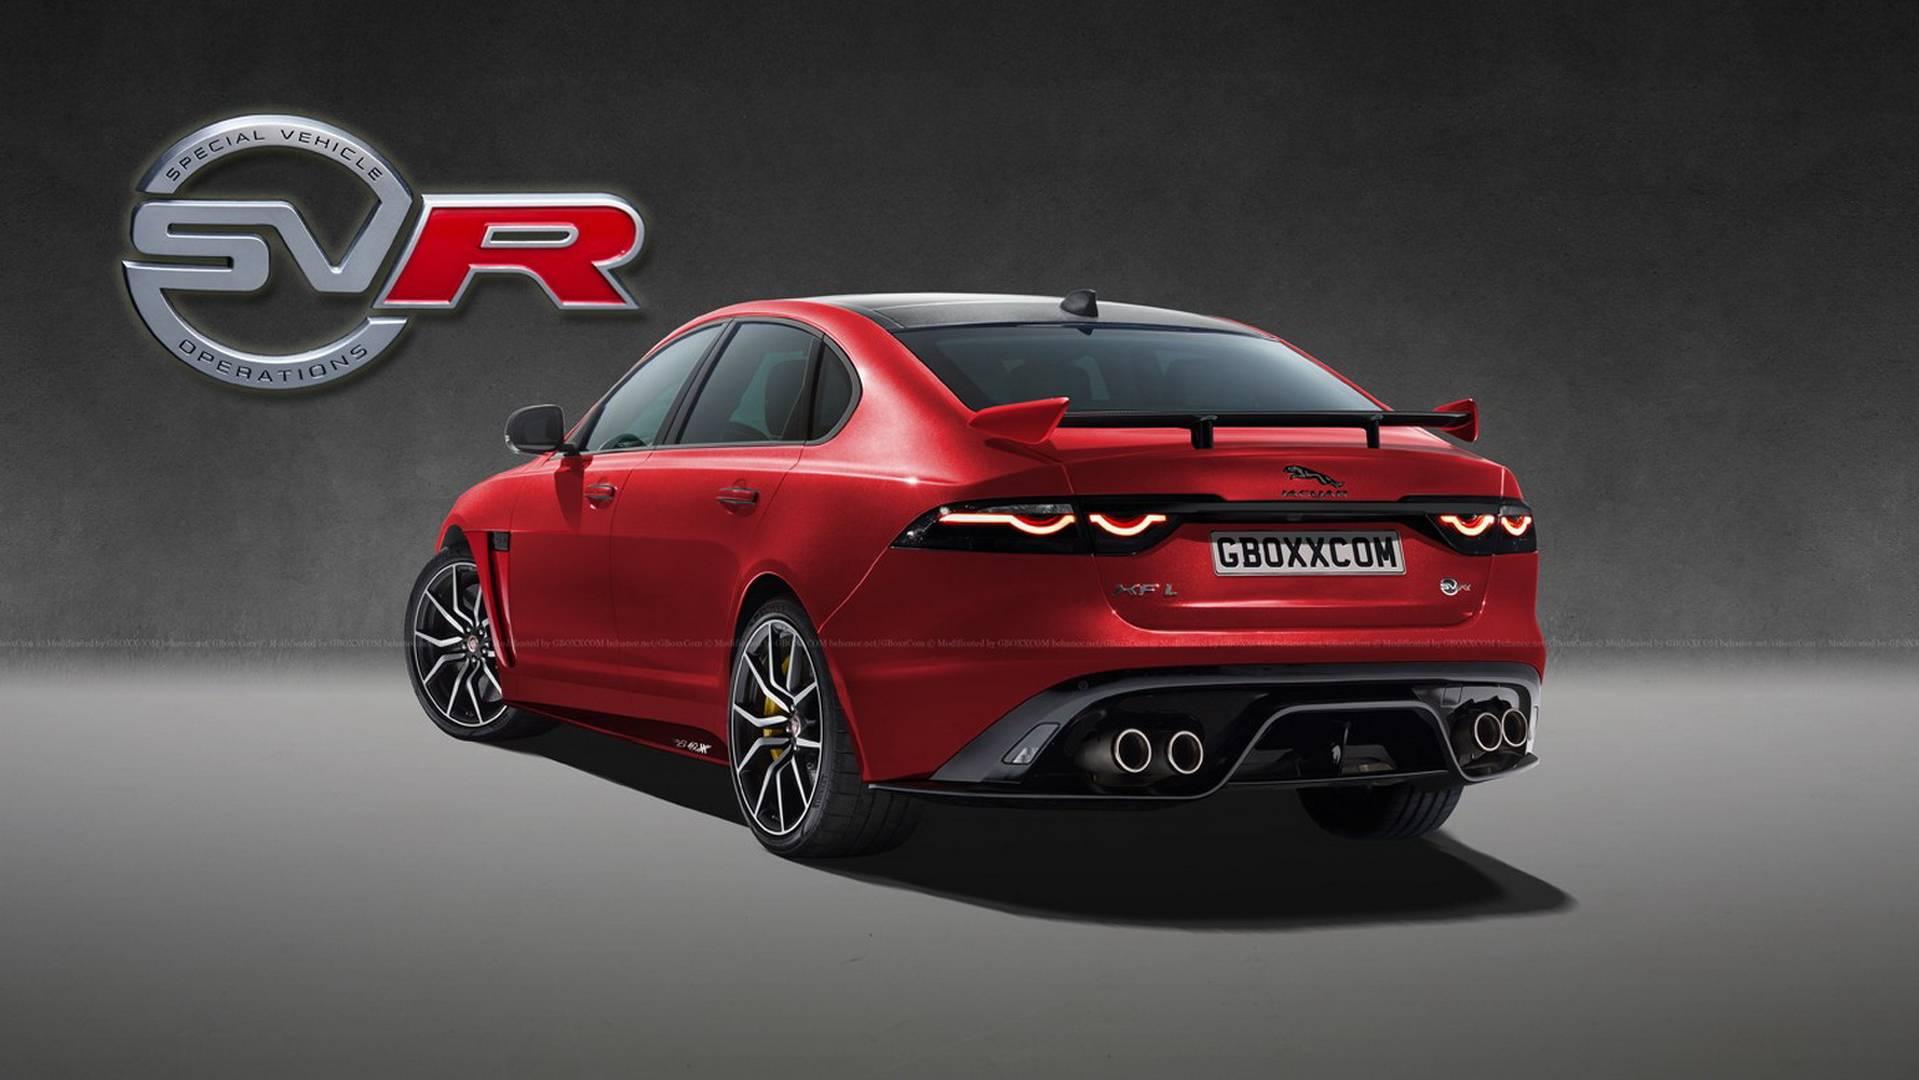 jaguar xf svr render جگوار XF SVR بررسی و نقد   اجاره ماشین